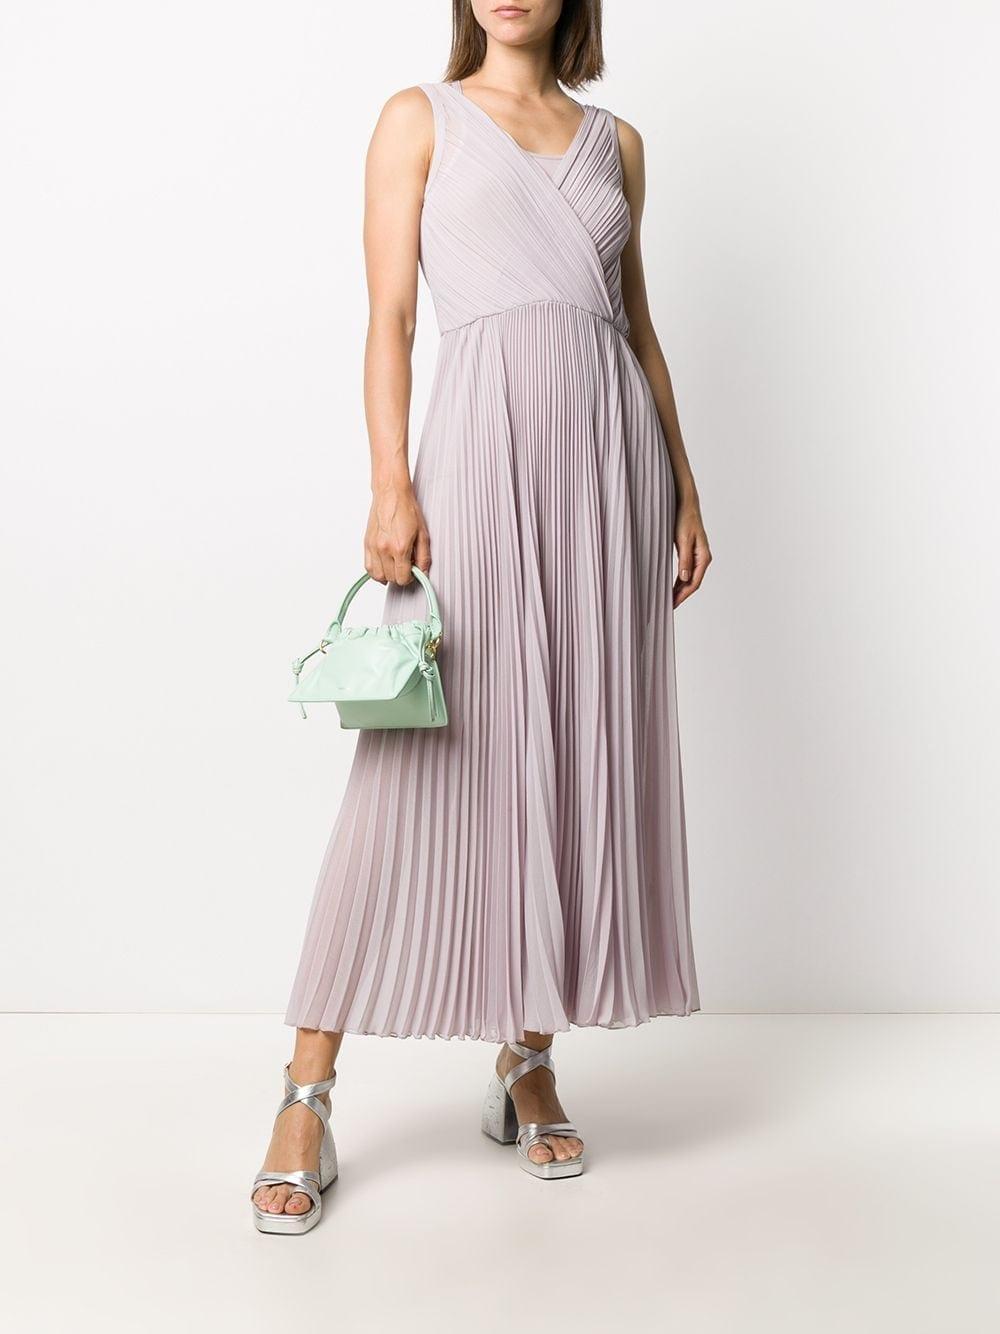 PATRIZIA PEPE Pleated Belted Dress